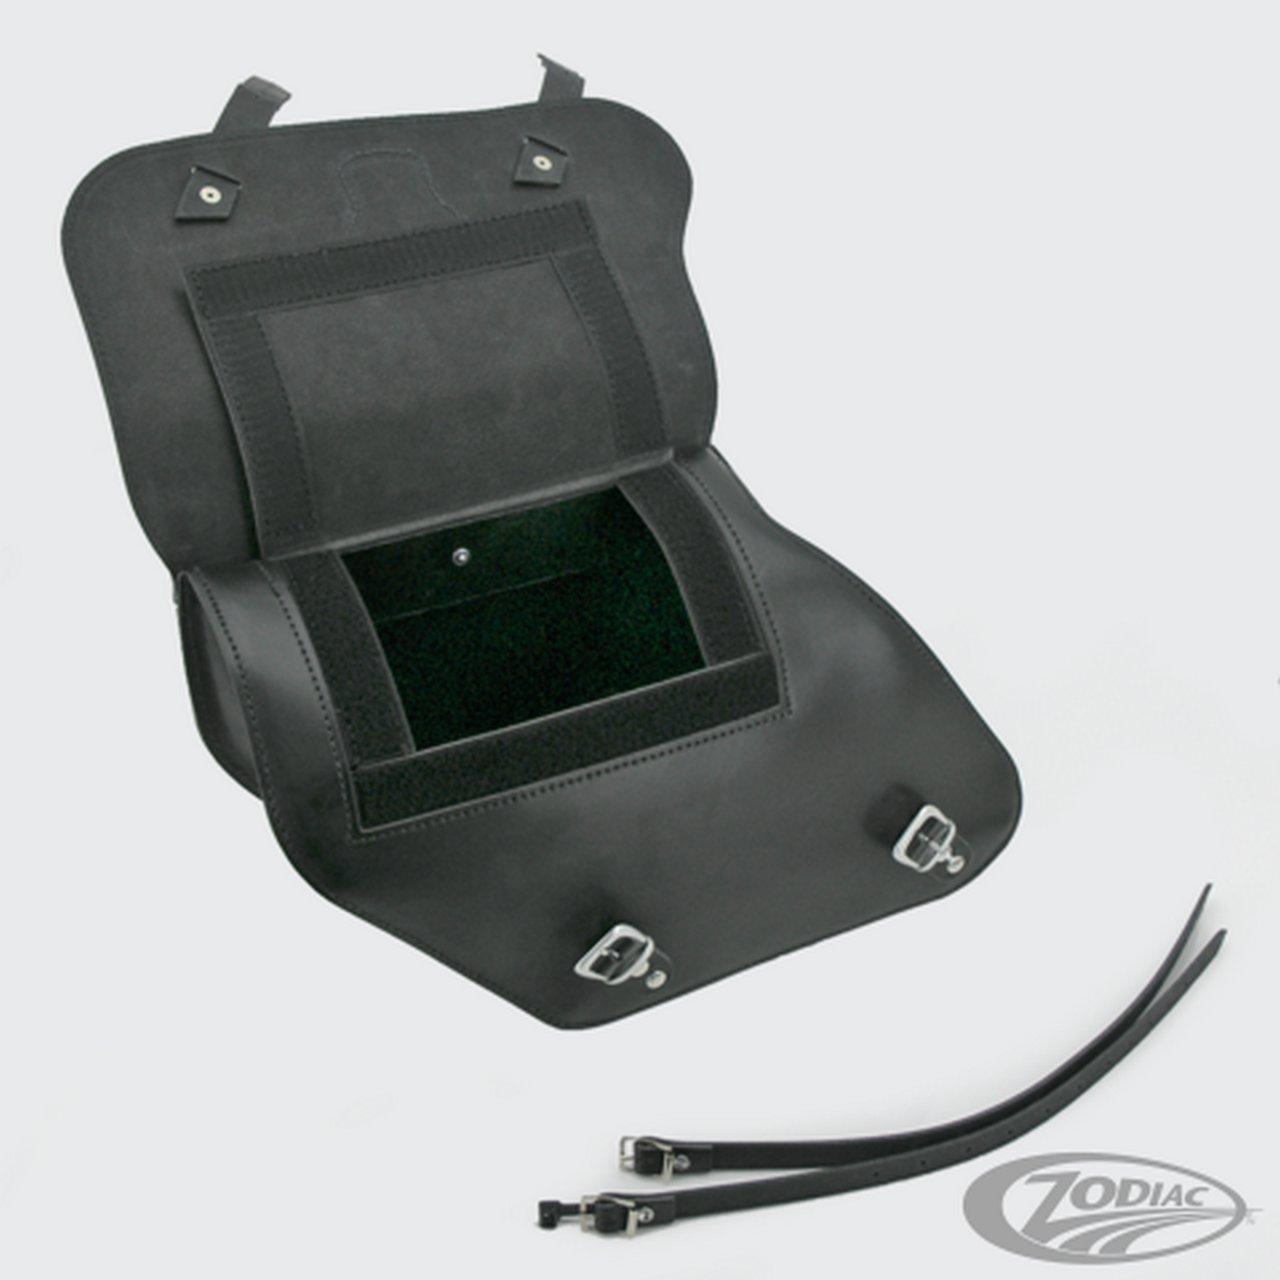 TEXAS LEATHER テキサスレザー:Texas Leather sidebag